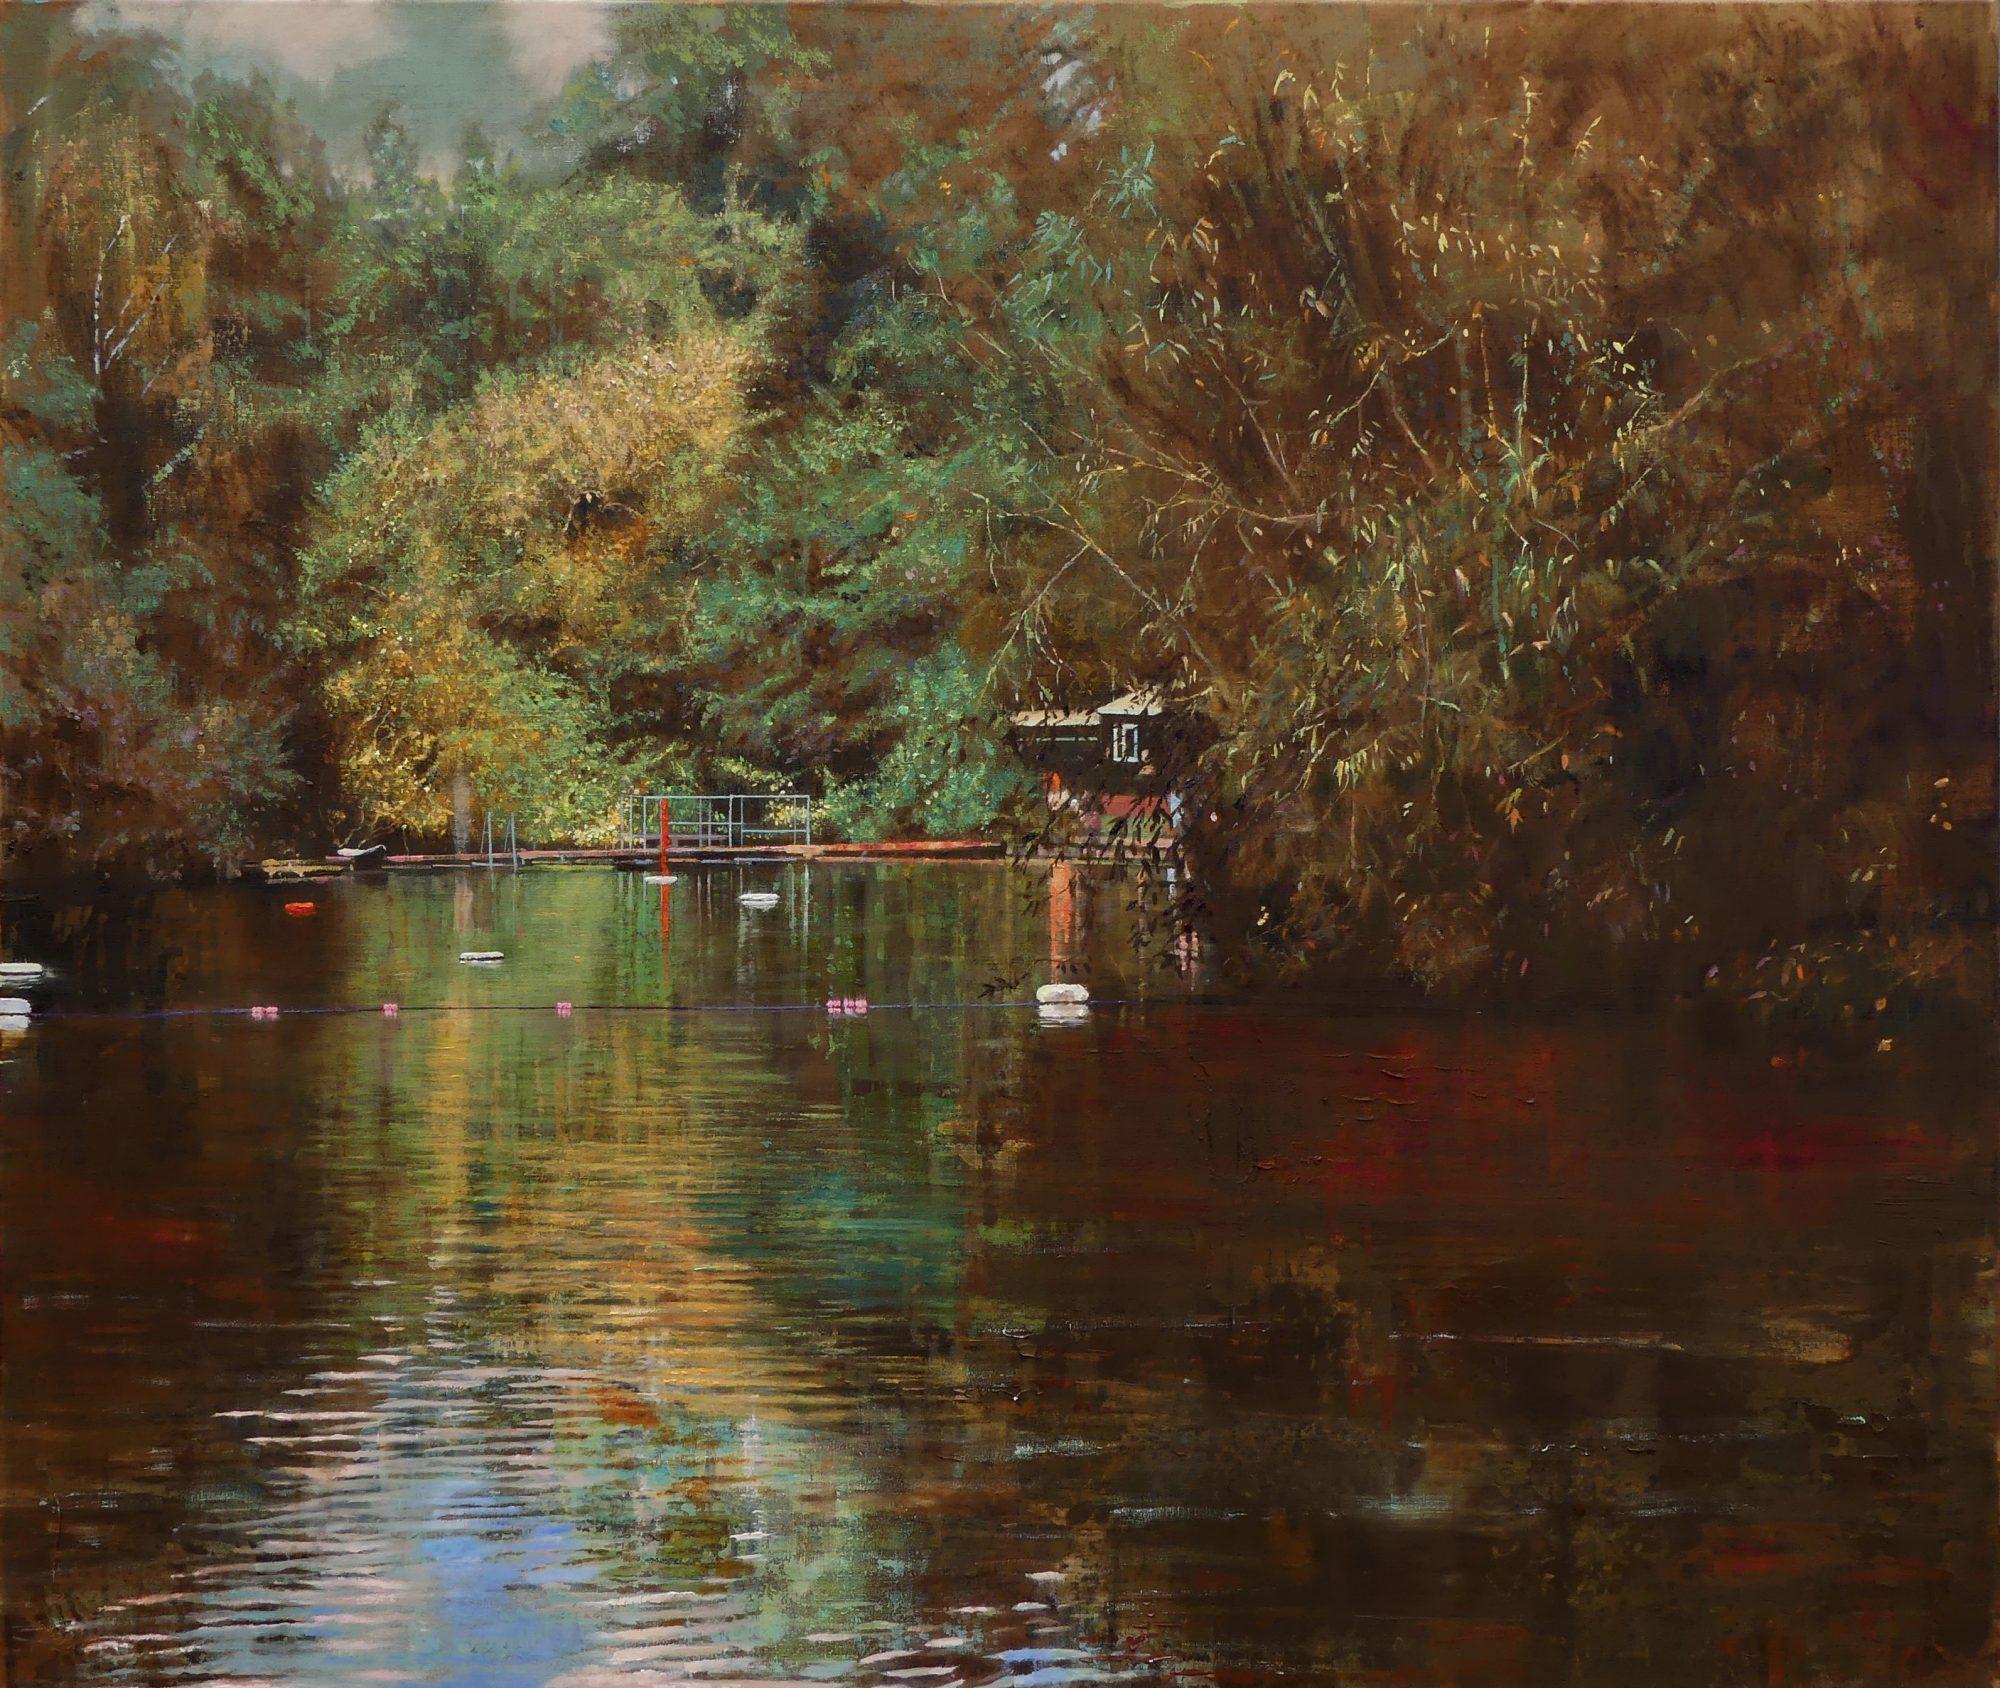 schilderij Isabella Werkhoven pond zwemvijver water bos